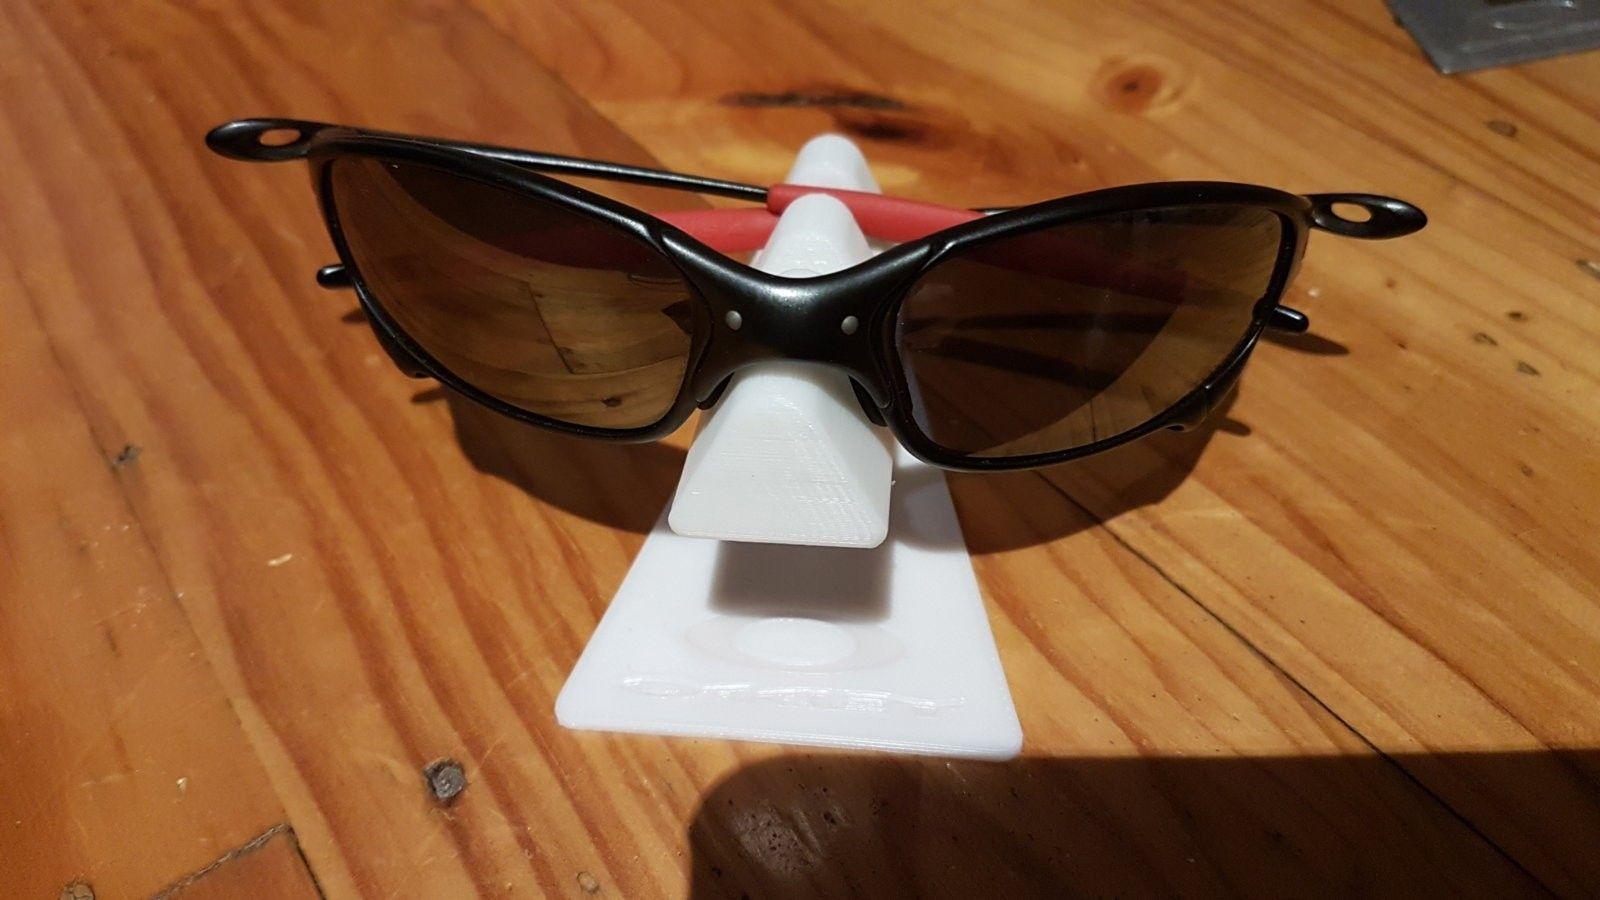 3D Printed Stuff - 20161002_041943.jpg